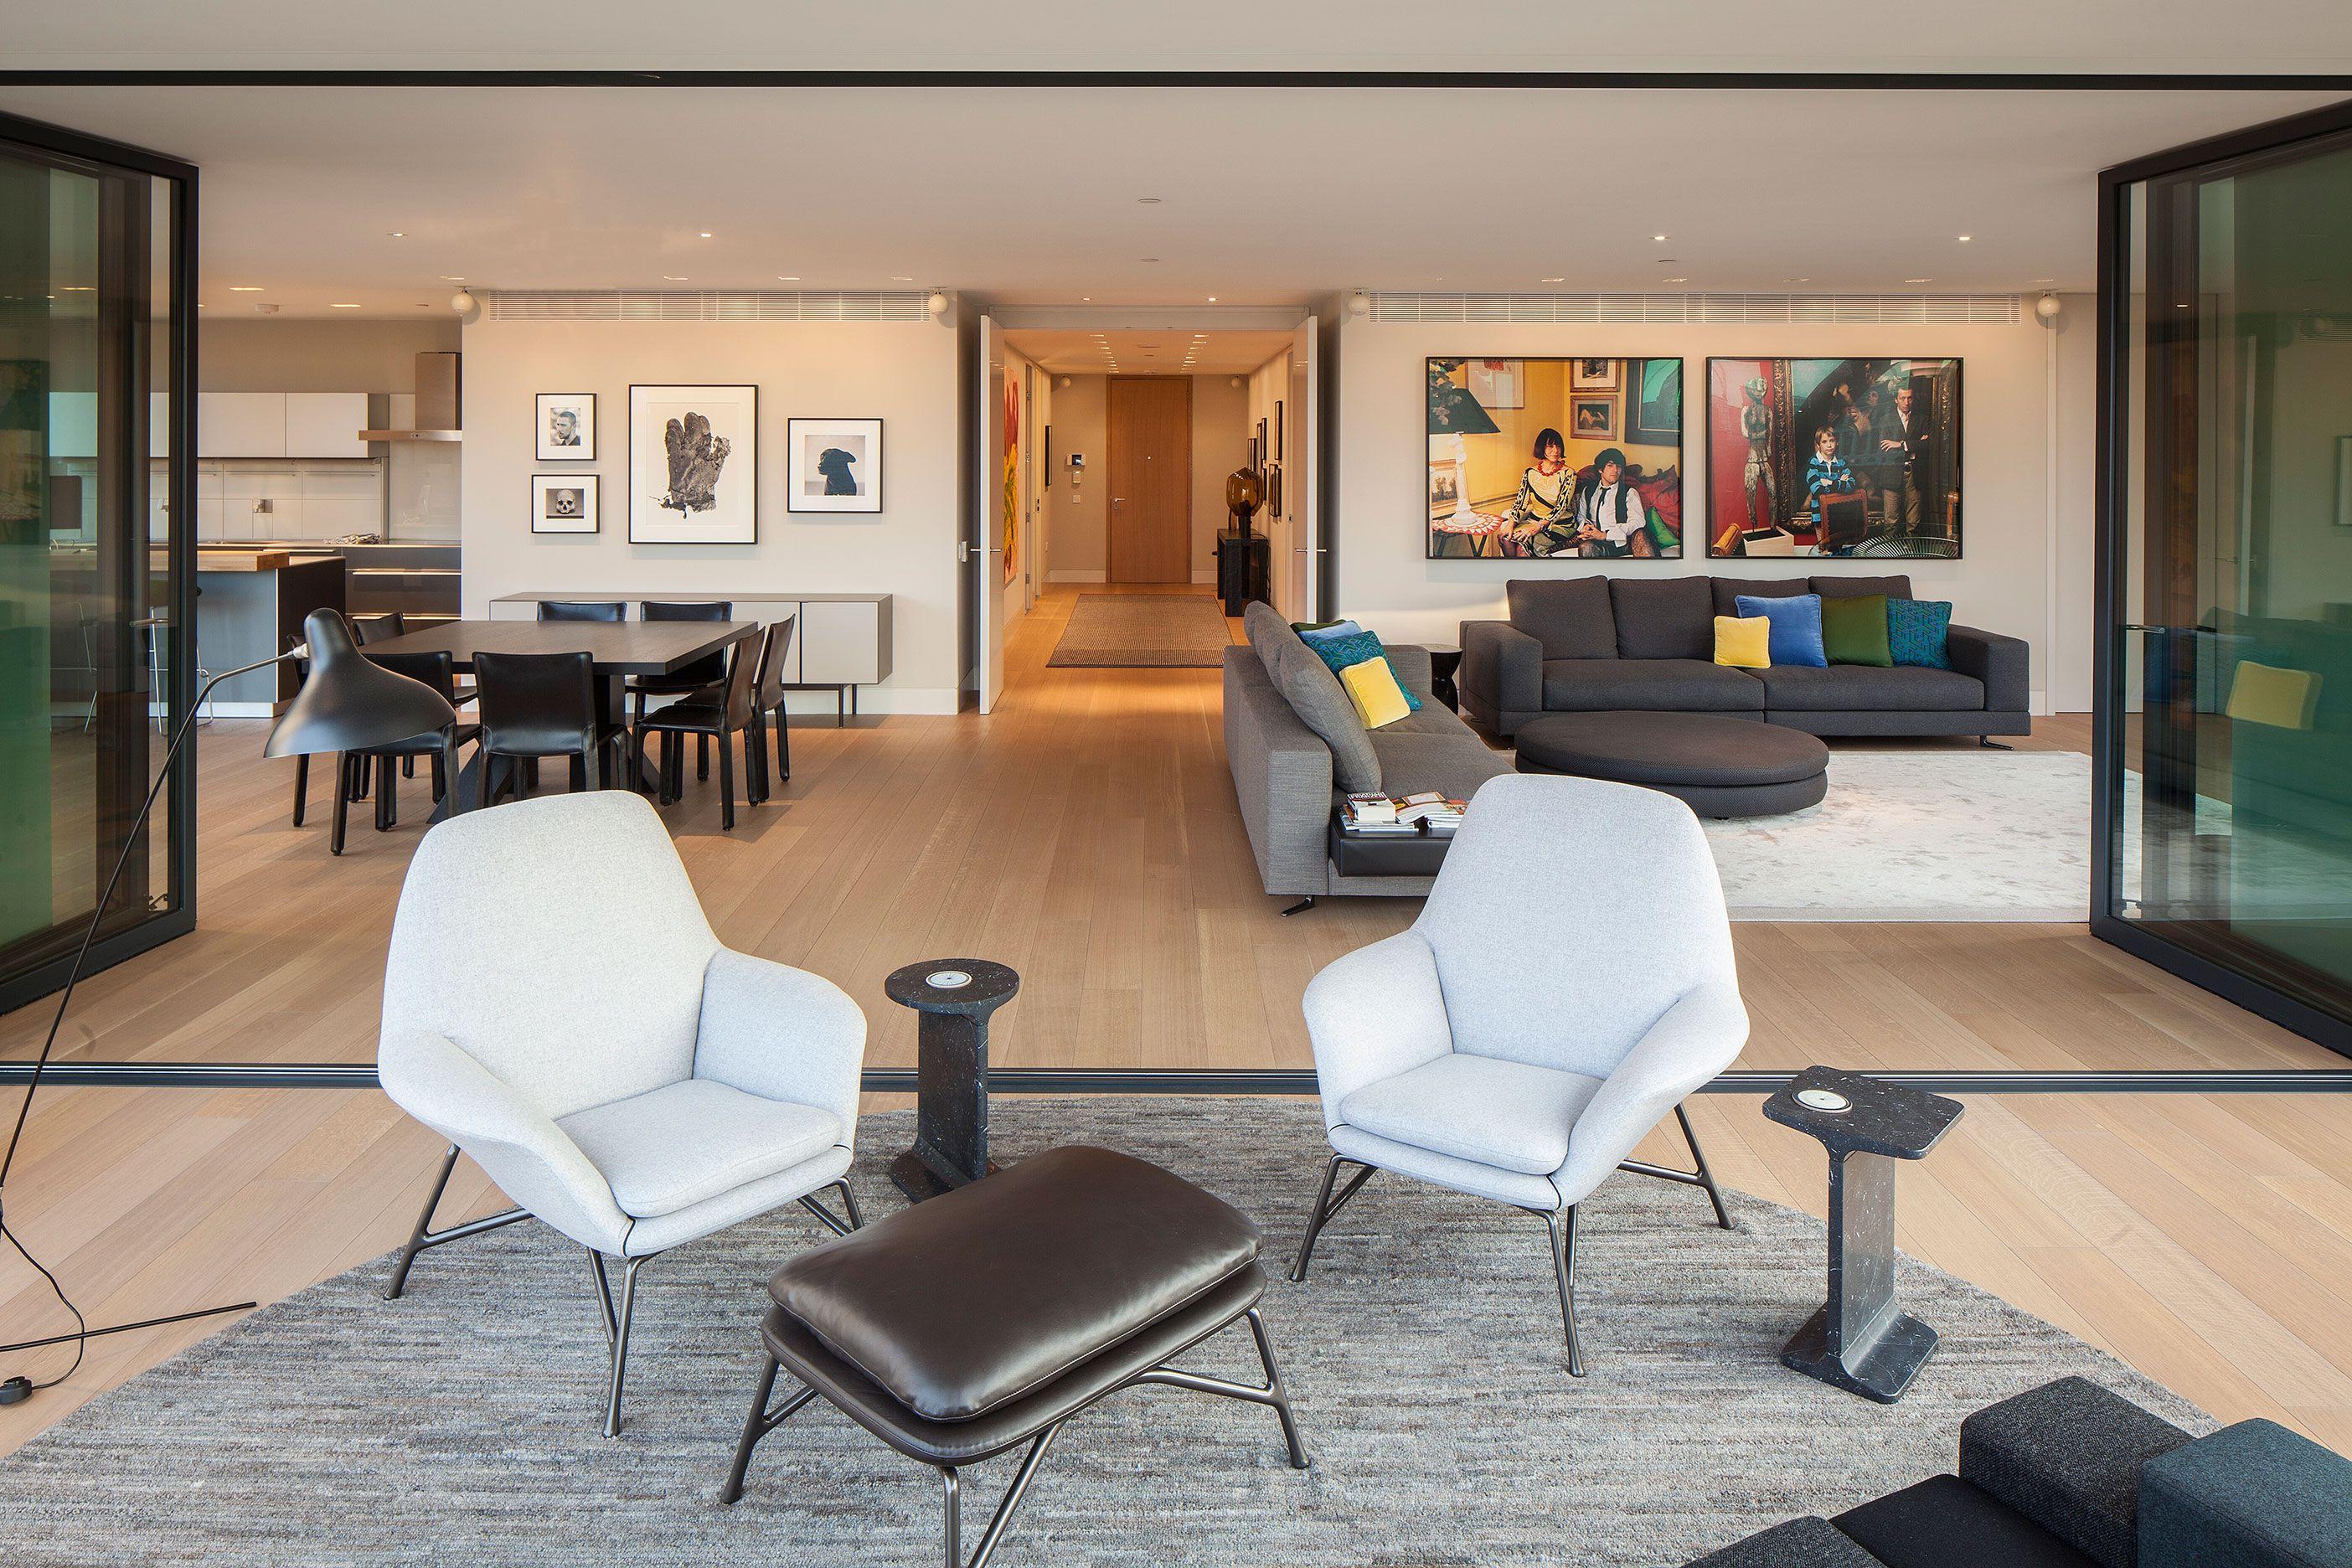 #apartment #modern #interior #residential #architecture #design #furniture # London